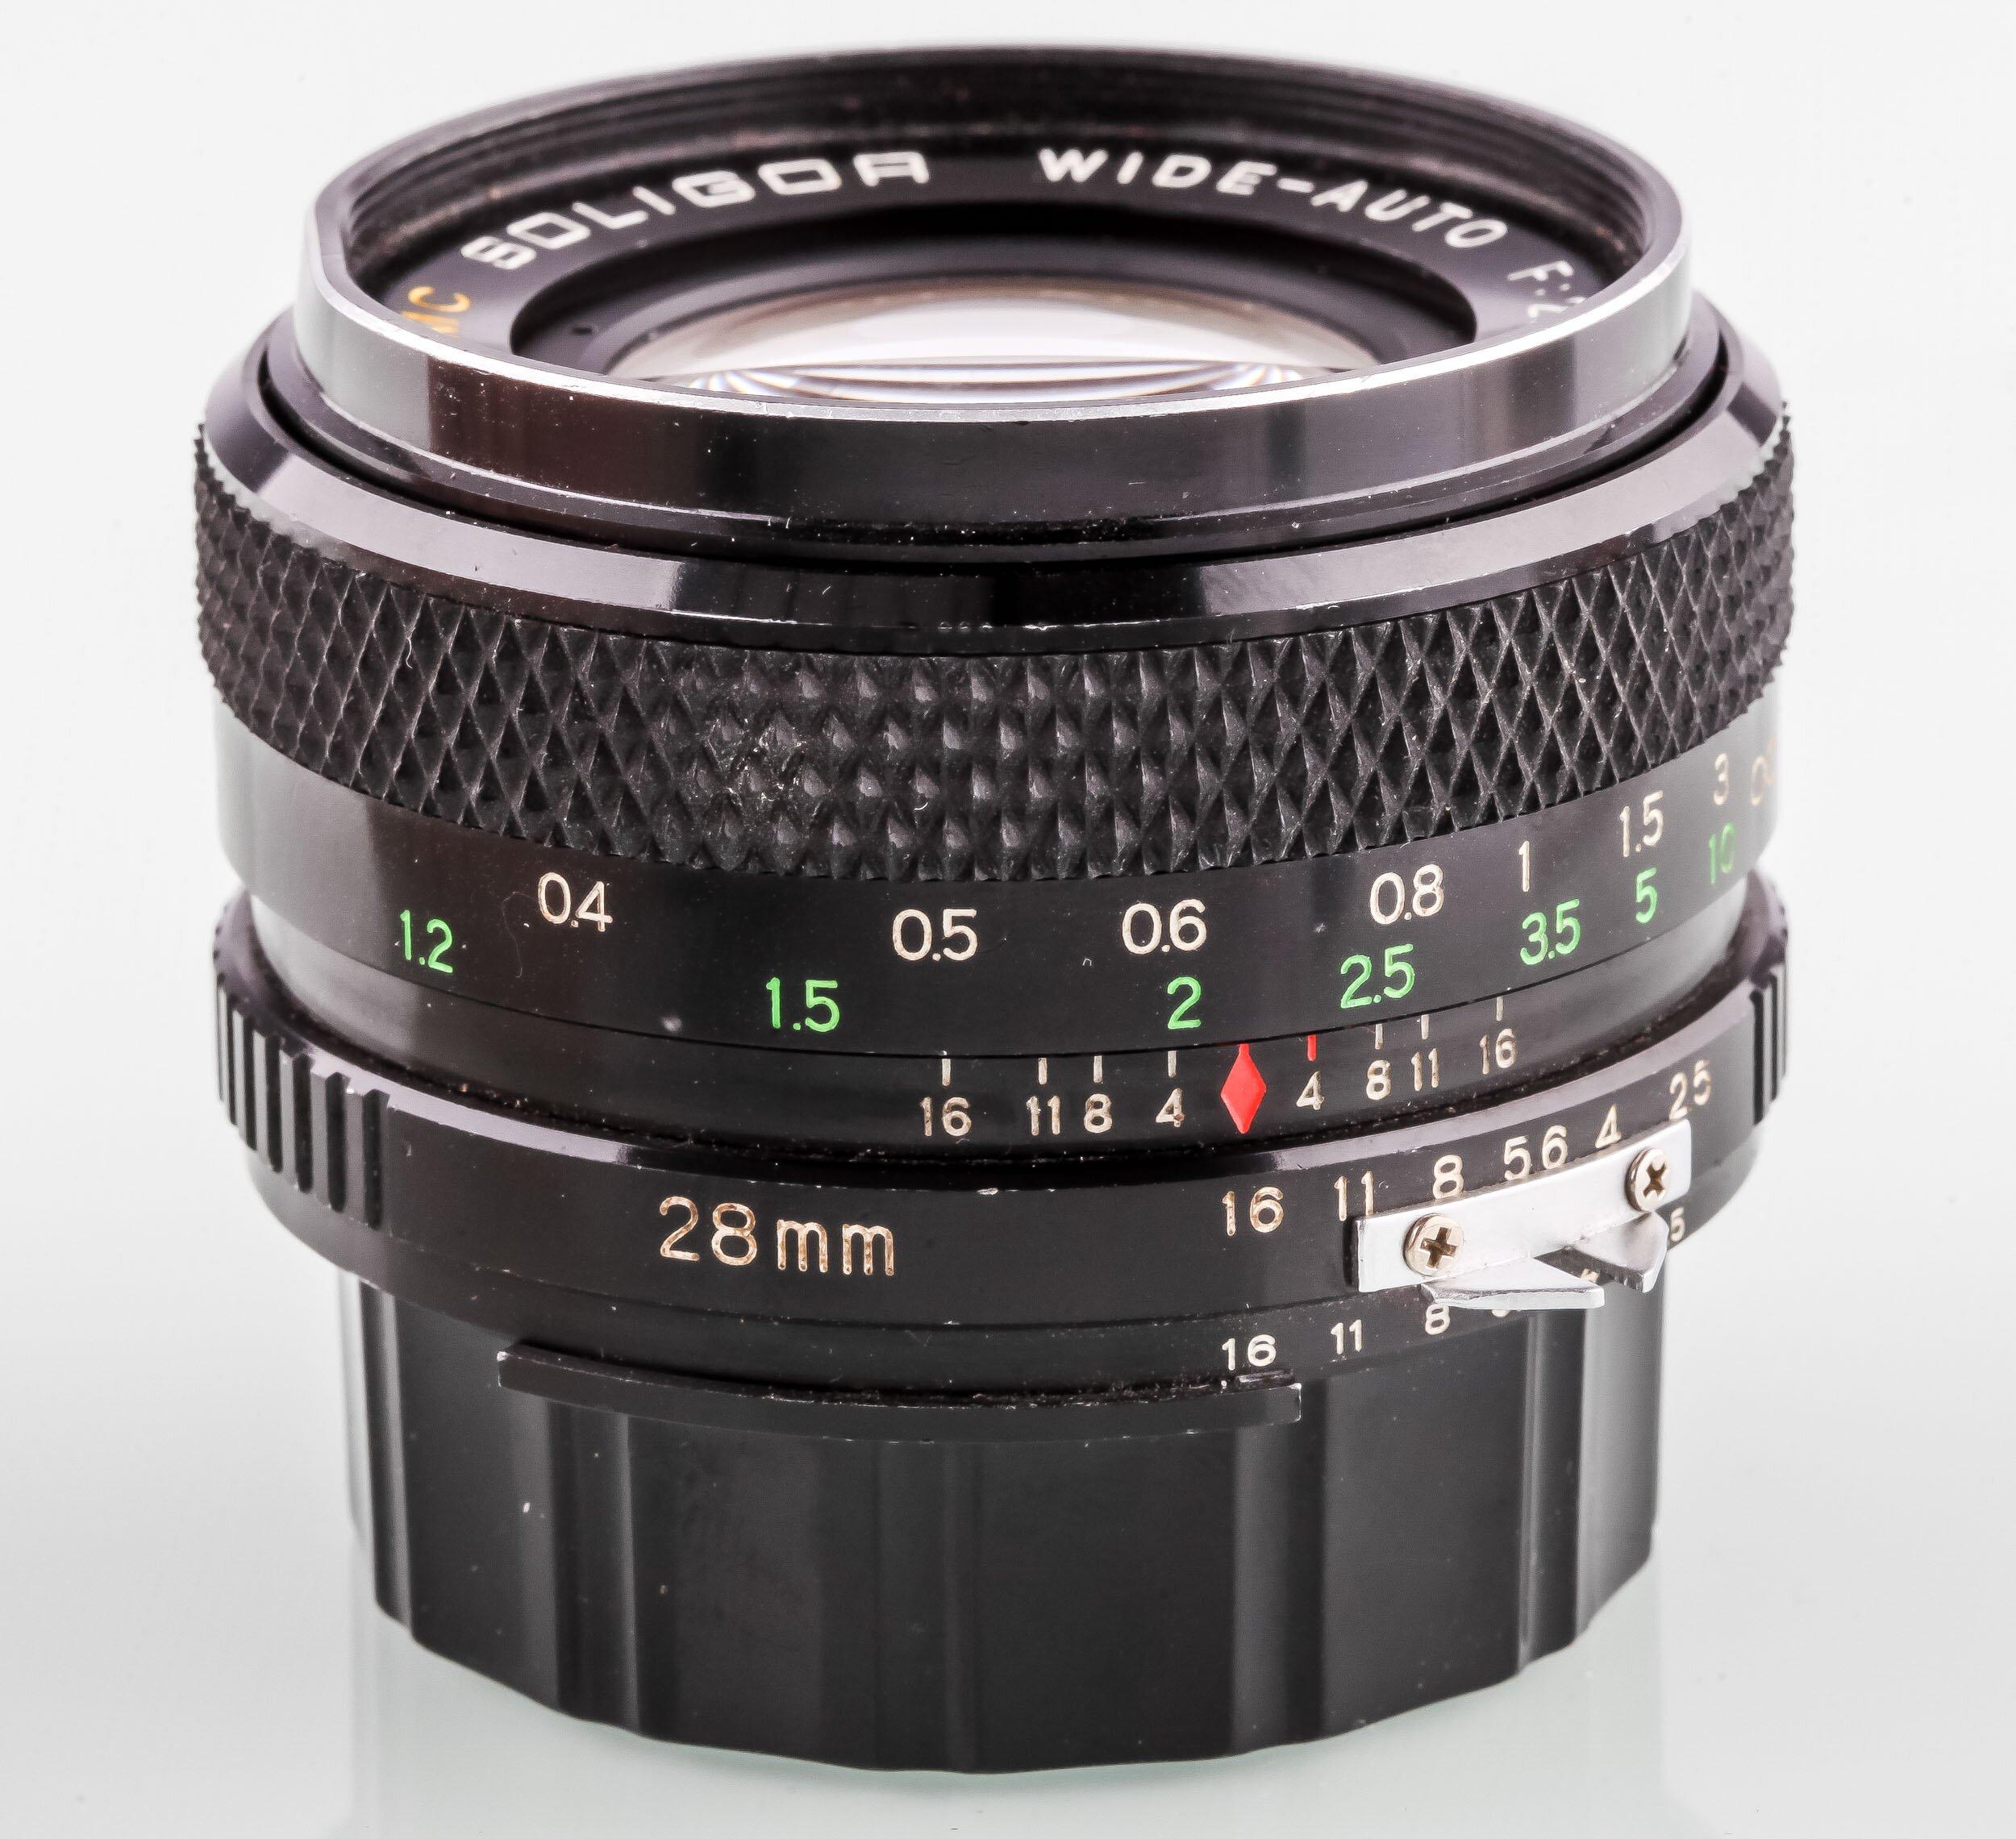 Soligor f.Nikon Wide-Auto 2,5/28mm MC